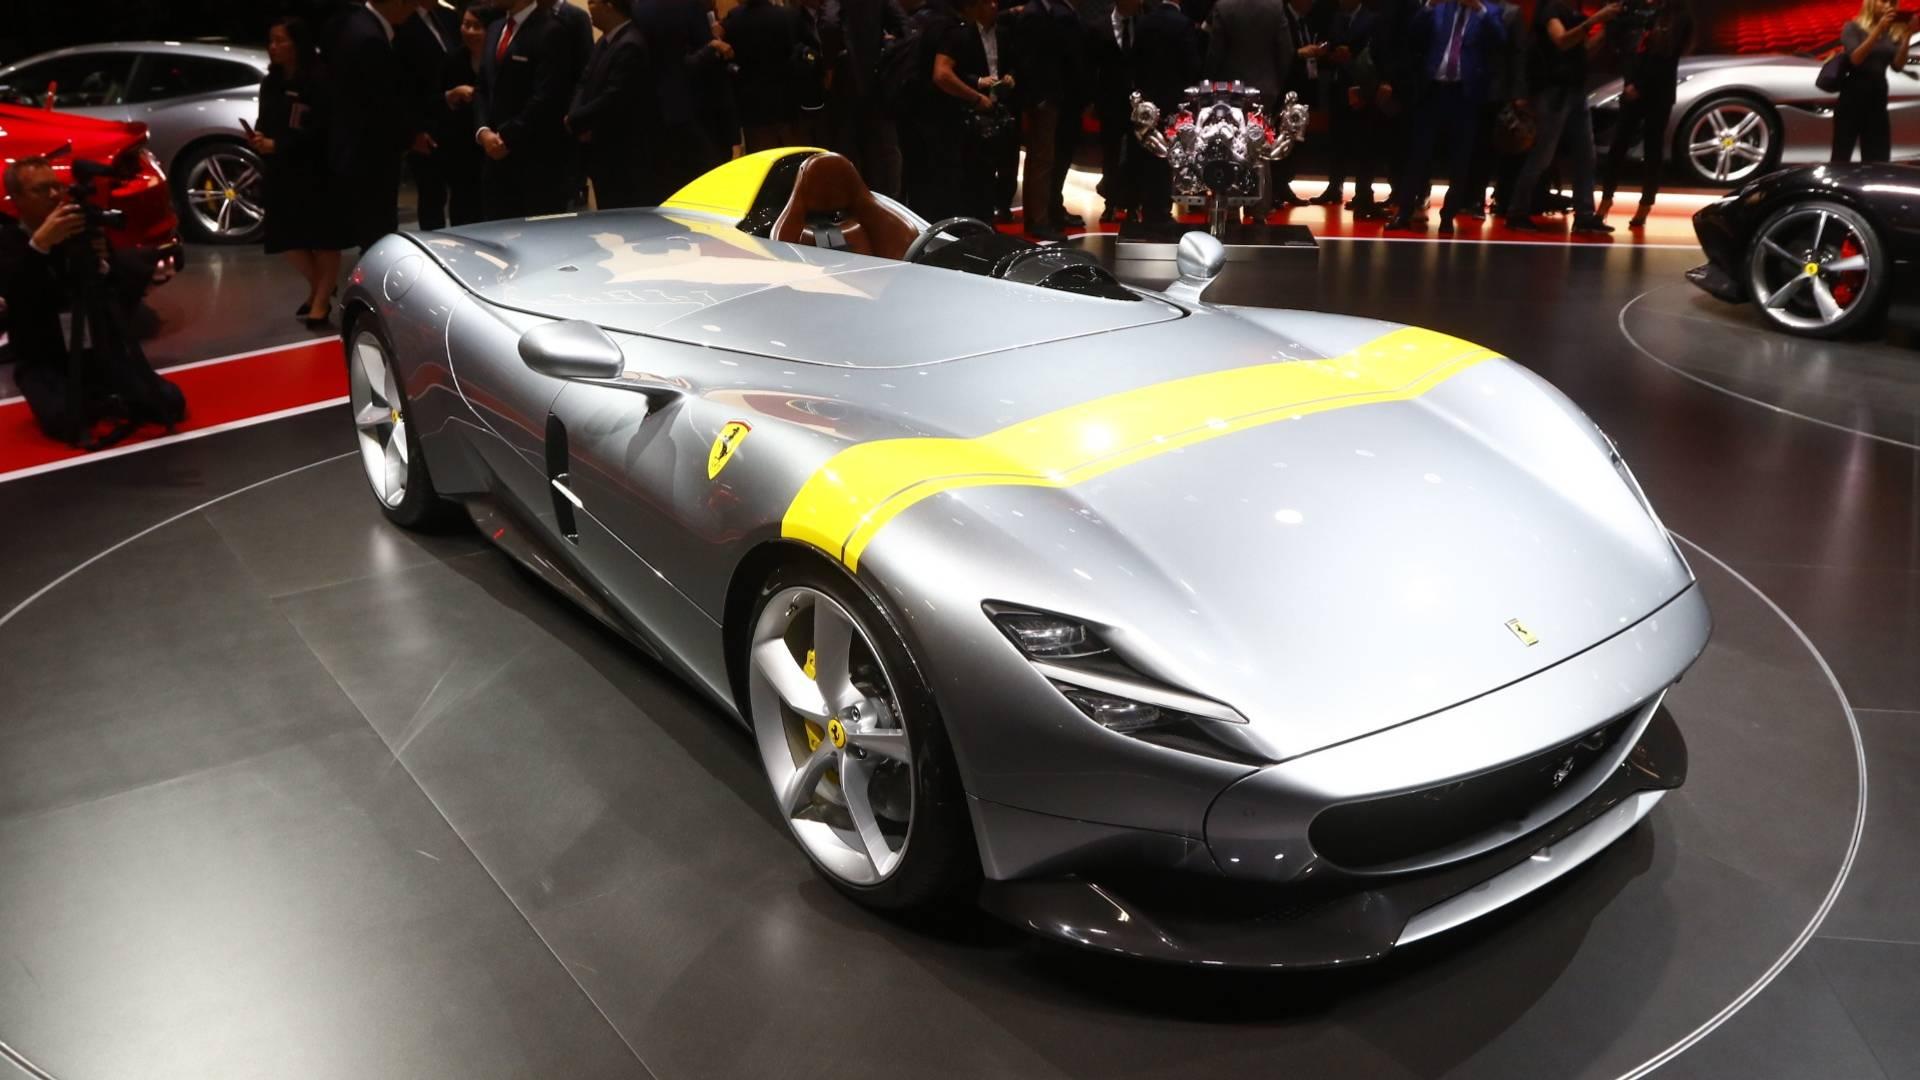 2018 Paris Motor Show: Ferrari Monza SP1 & SP2